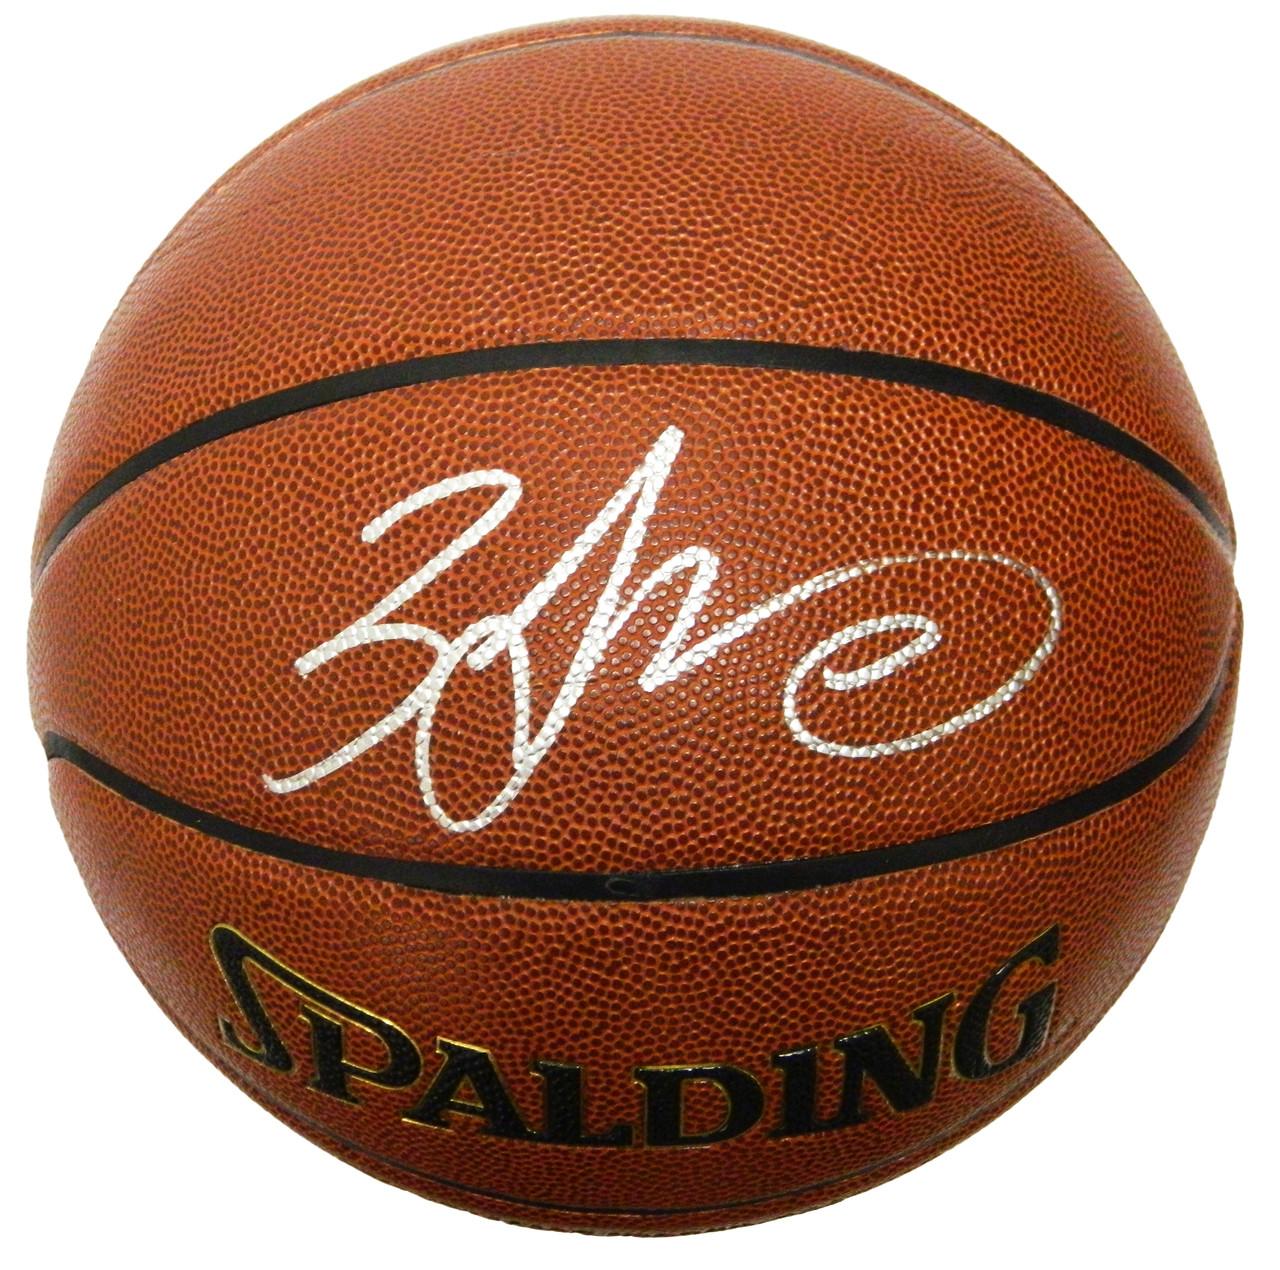 38013ac07 Zach LaVine Signed Spalding NBA Indoor Outdoor Basketball - Nikco Sports